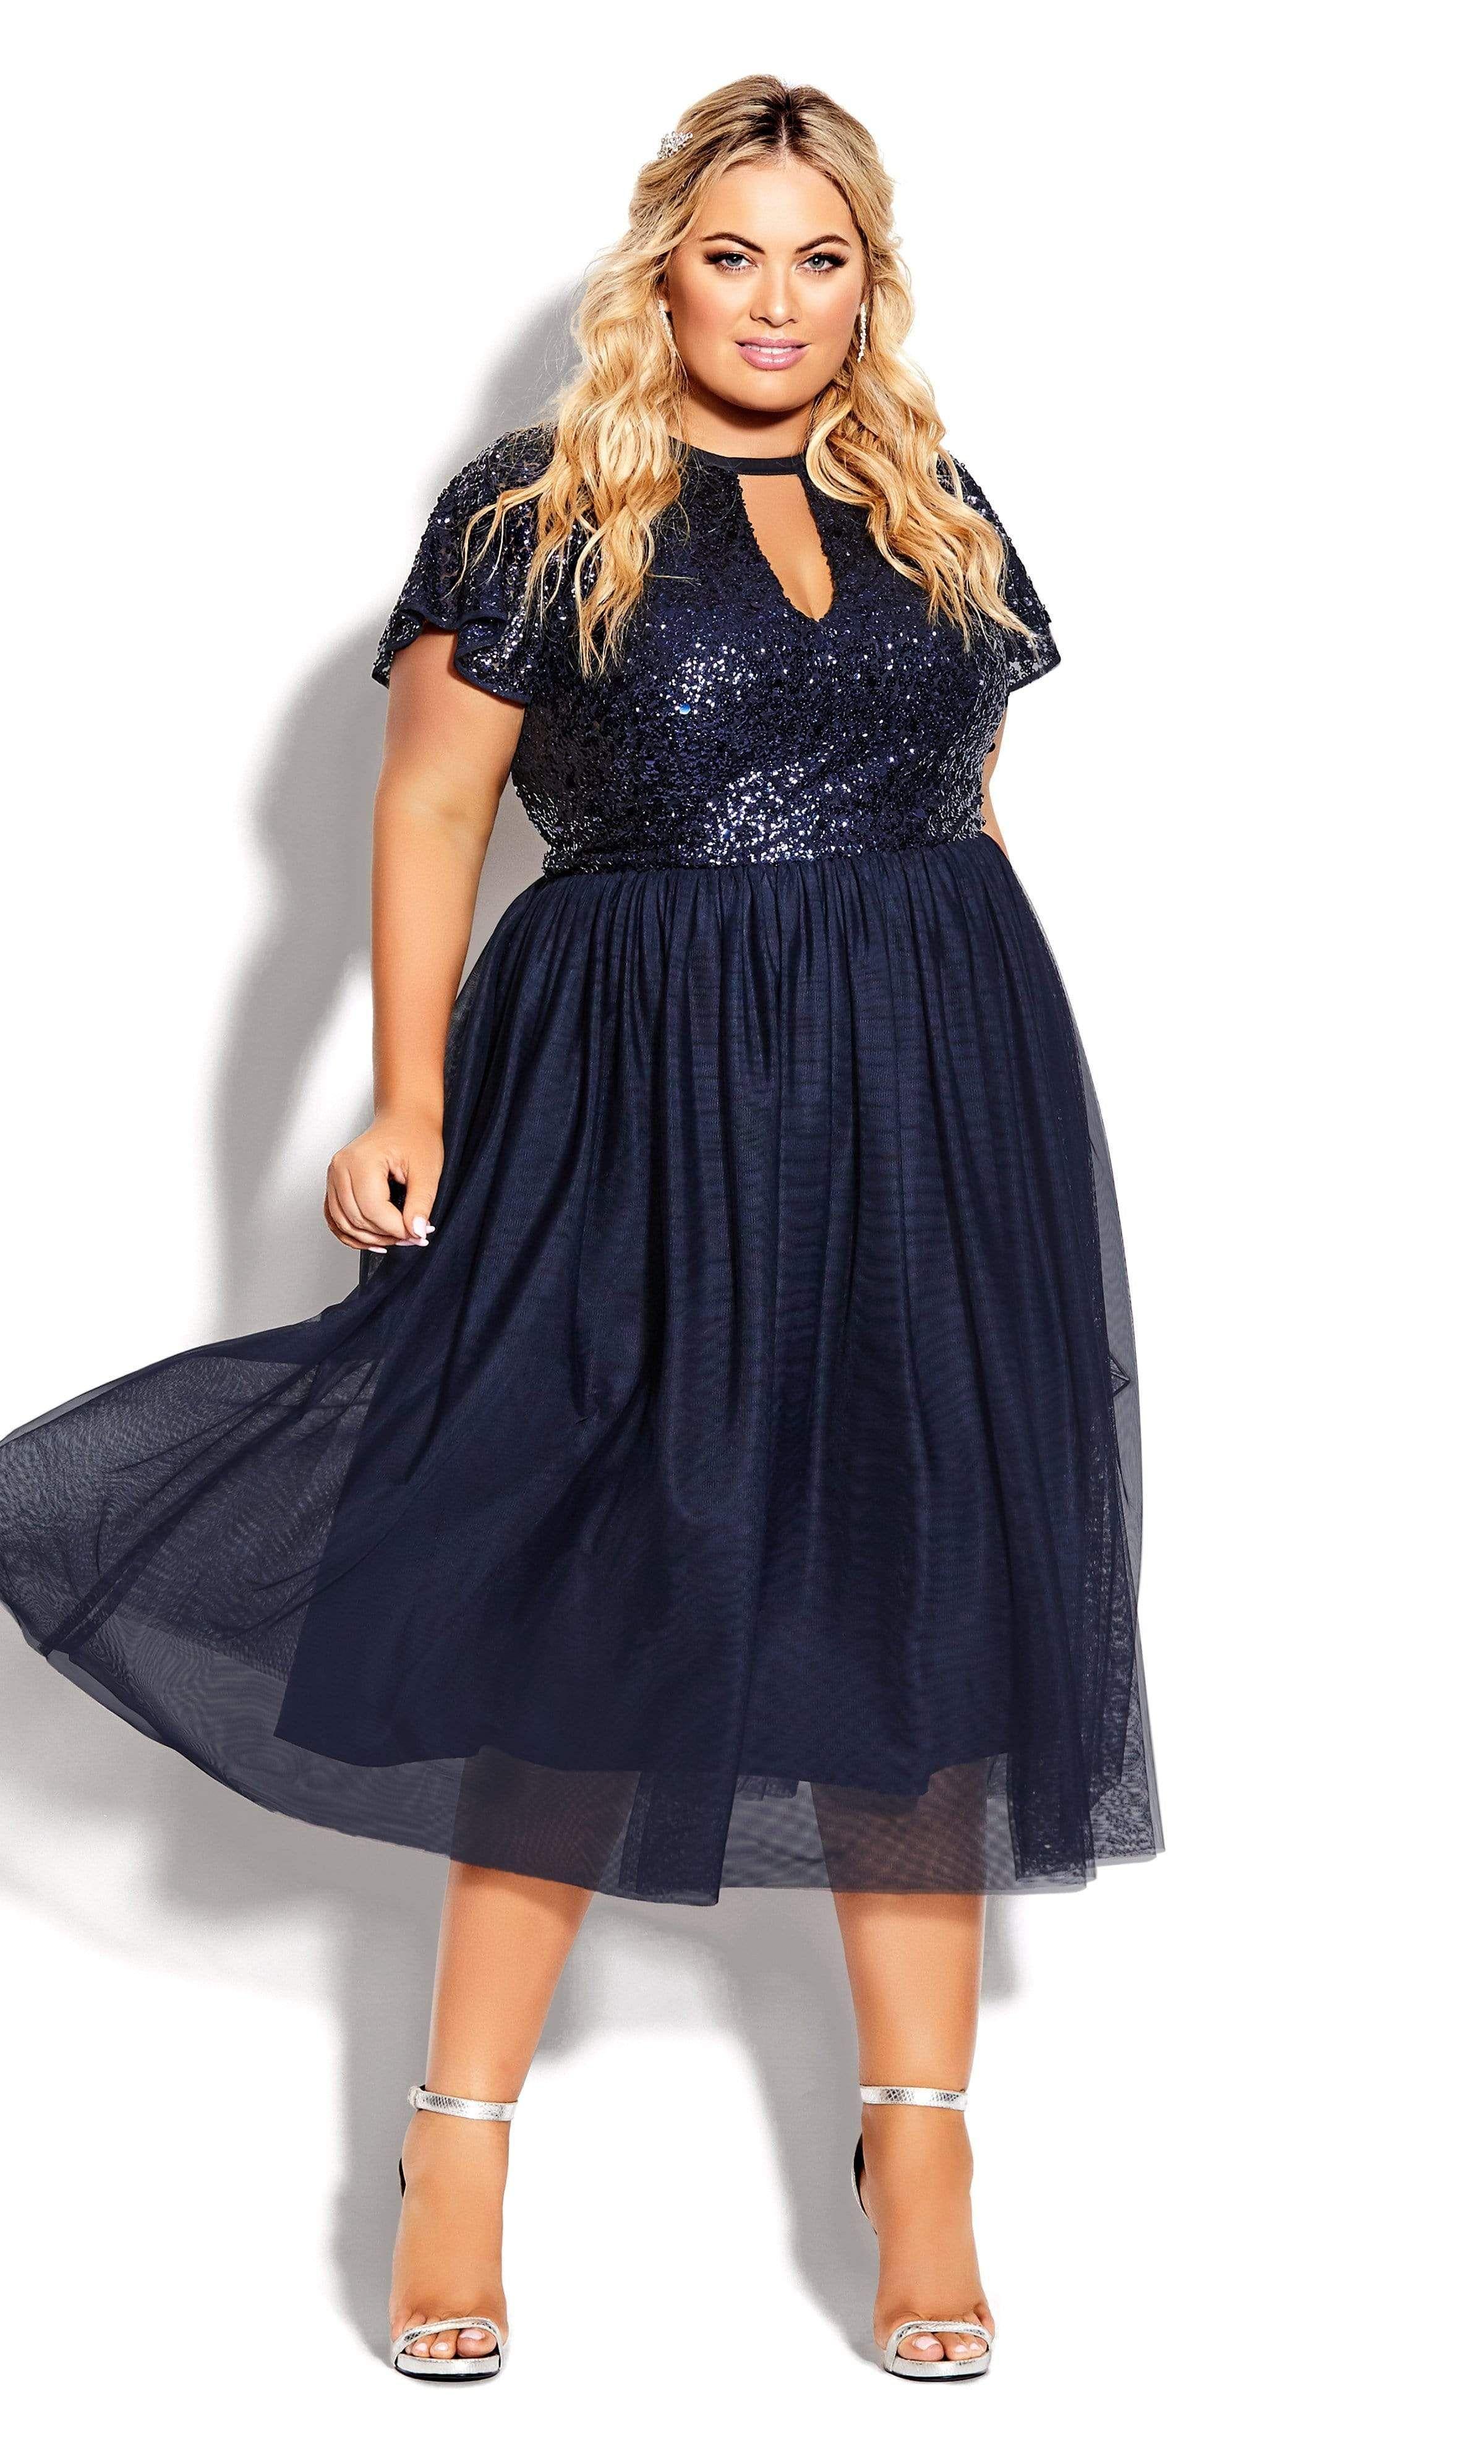 Pin By Lb On Fashion Plus Size Party Dresses Joy Dress Plus Size Wedding Guest Dresses [ 3984 x 2400 Pixel ]